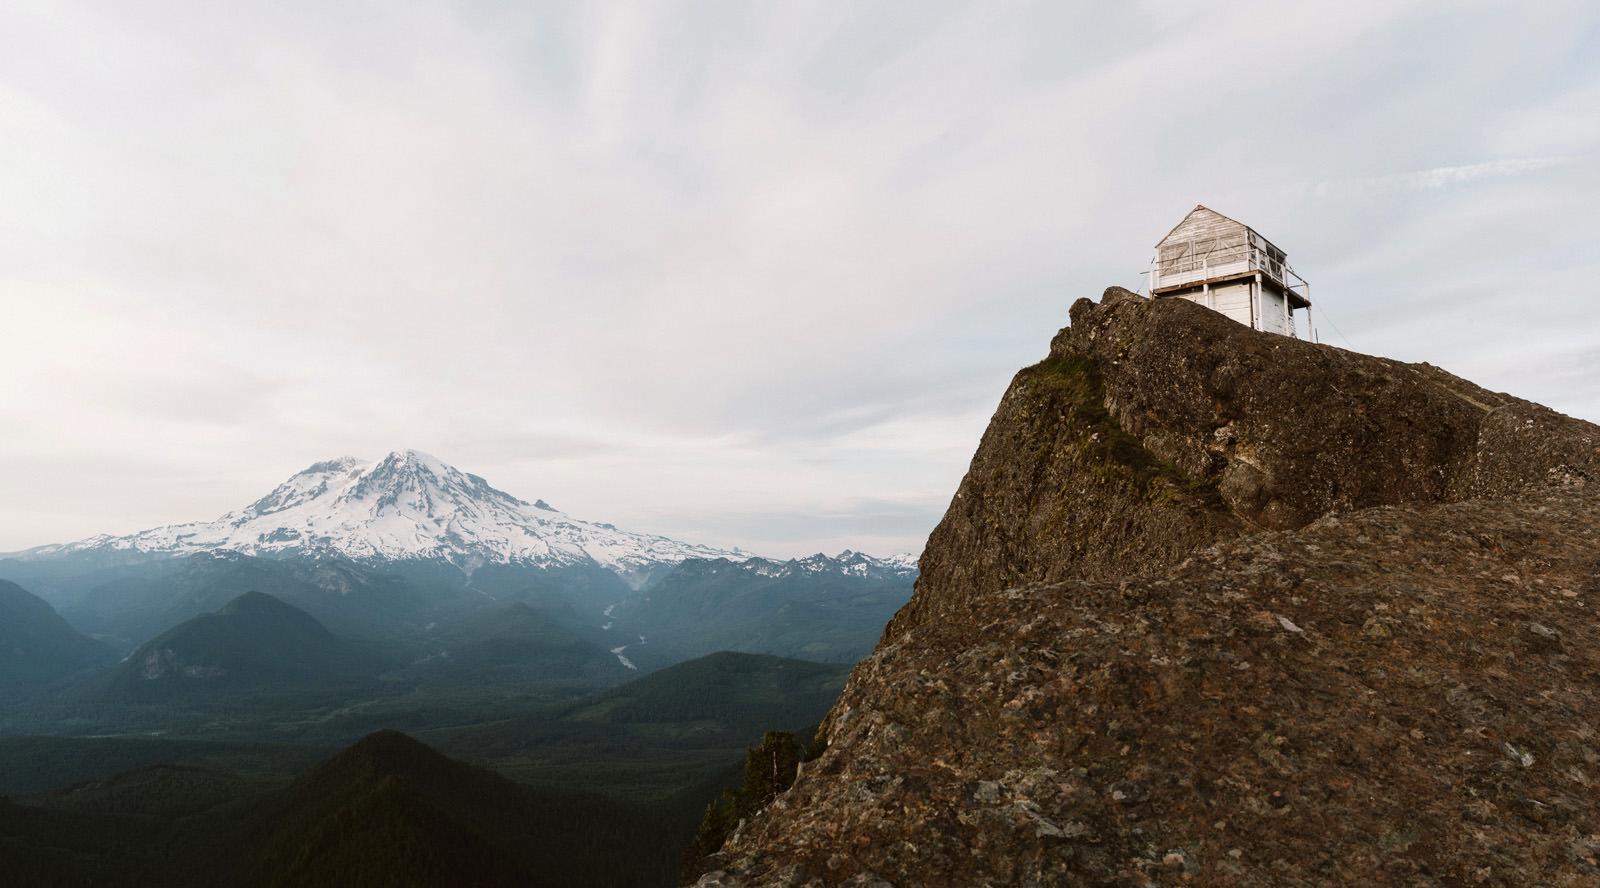 katelynnethan-blog-23 MOUNT RAINIER LOOKOUT ELOPEMENT